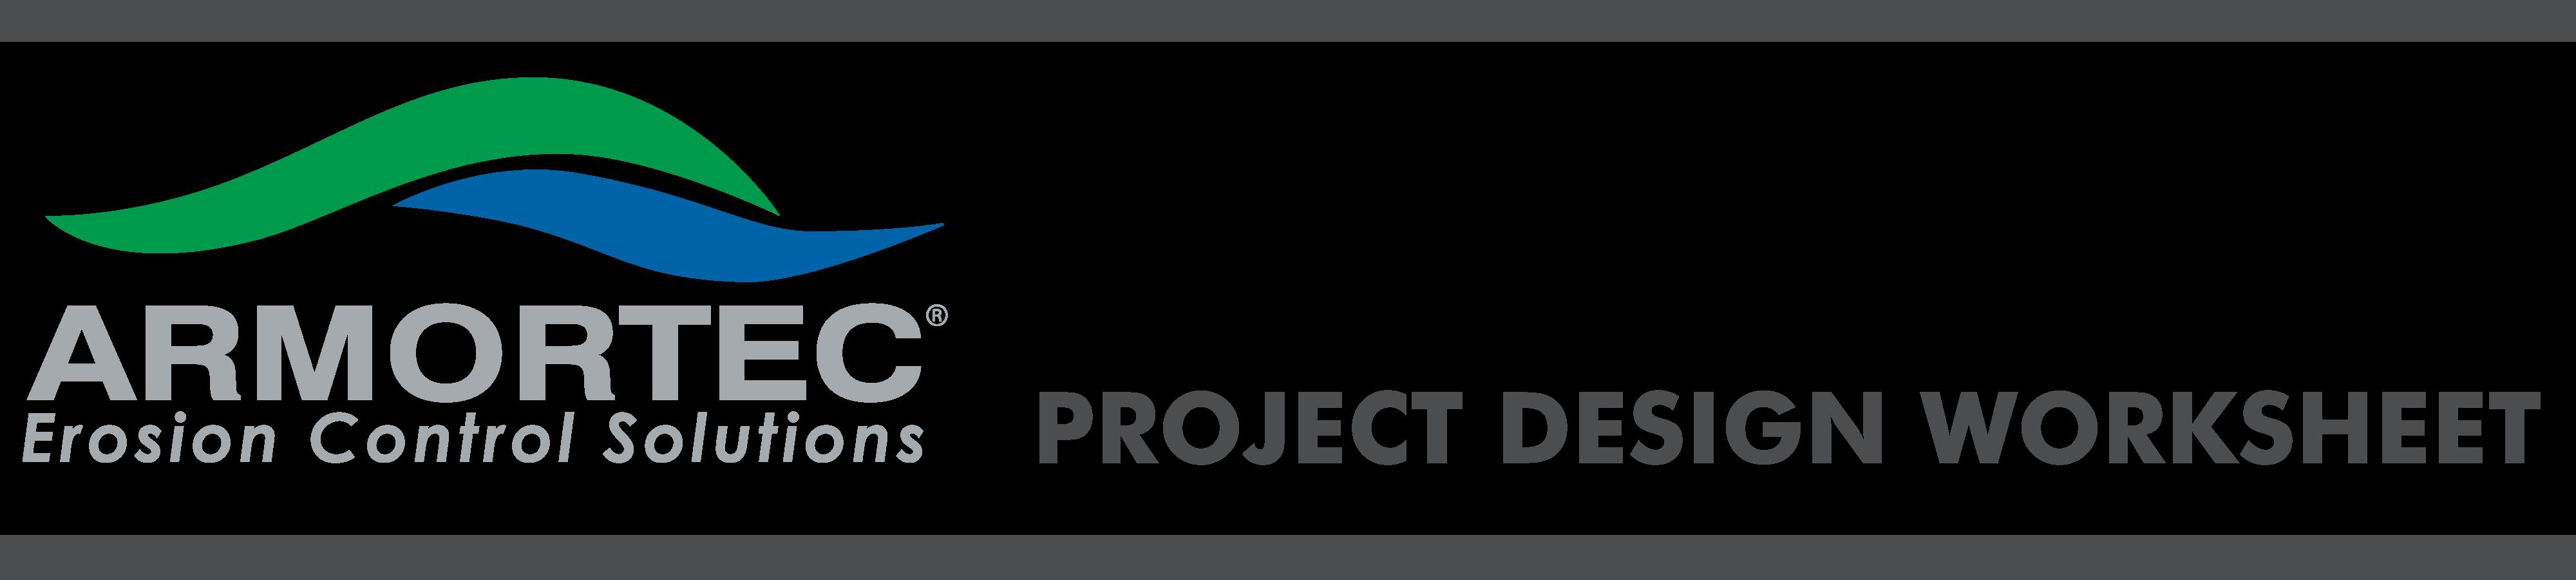 Armortec Project Design Worksheet